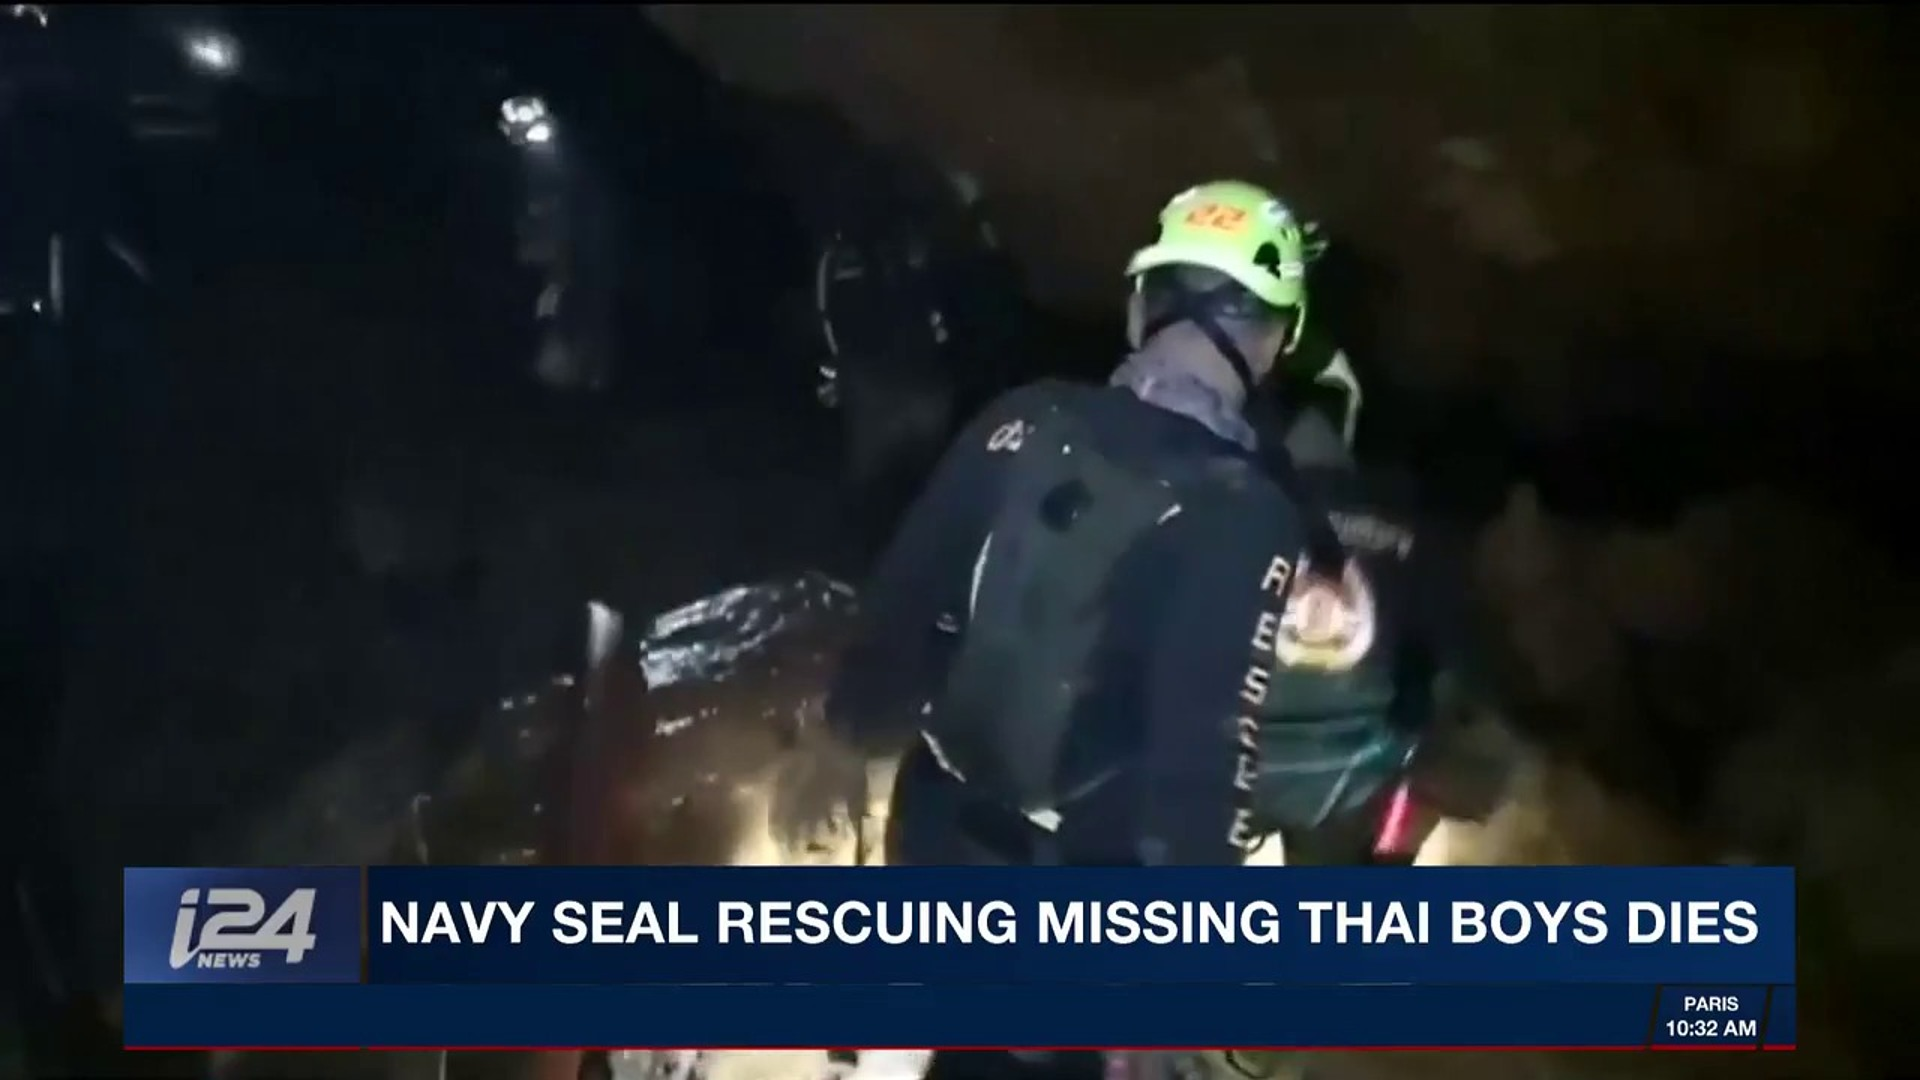 i24NEWS DESK | Navy seal rescuing missing Thai boys dies